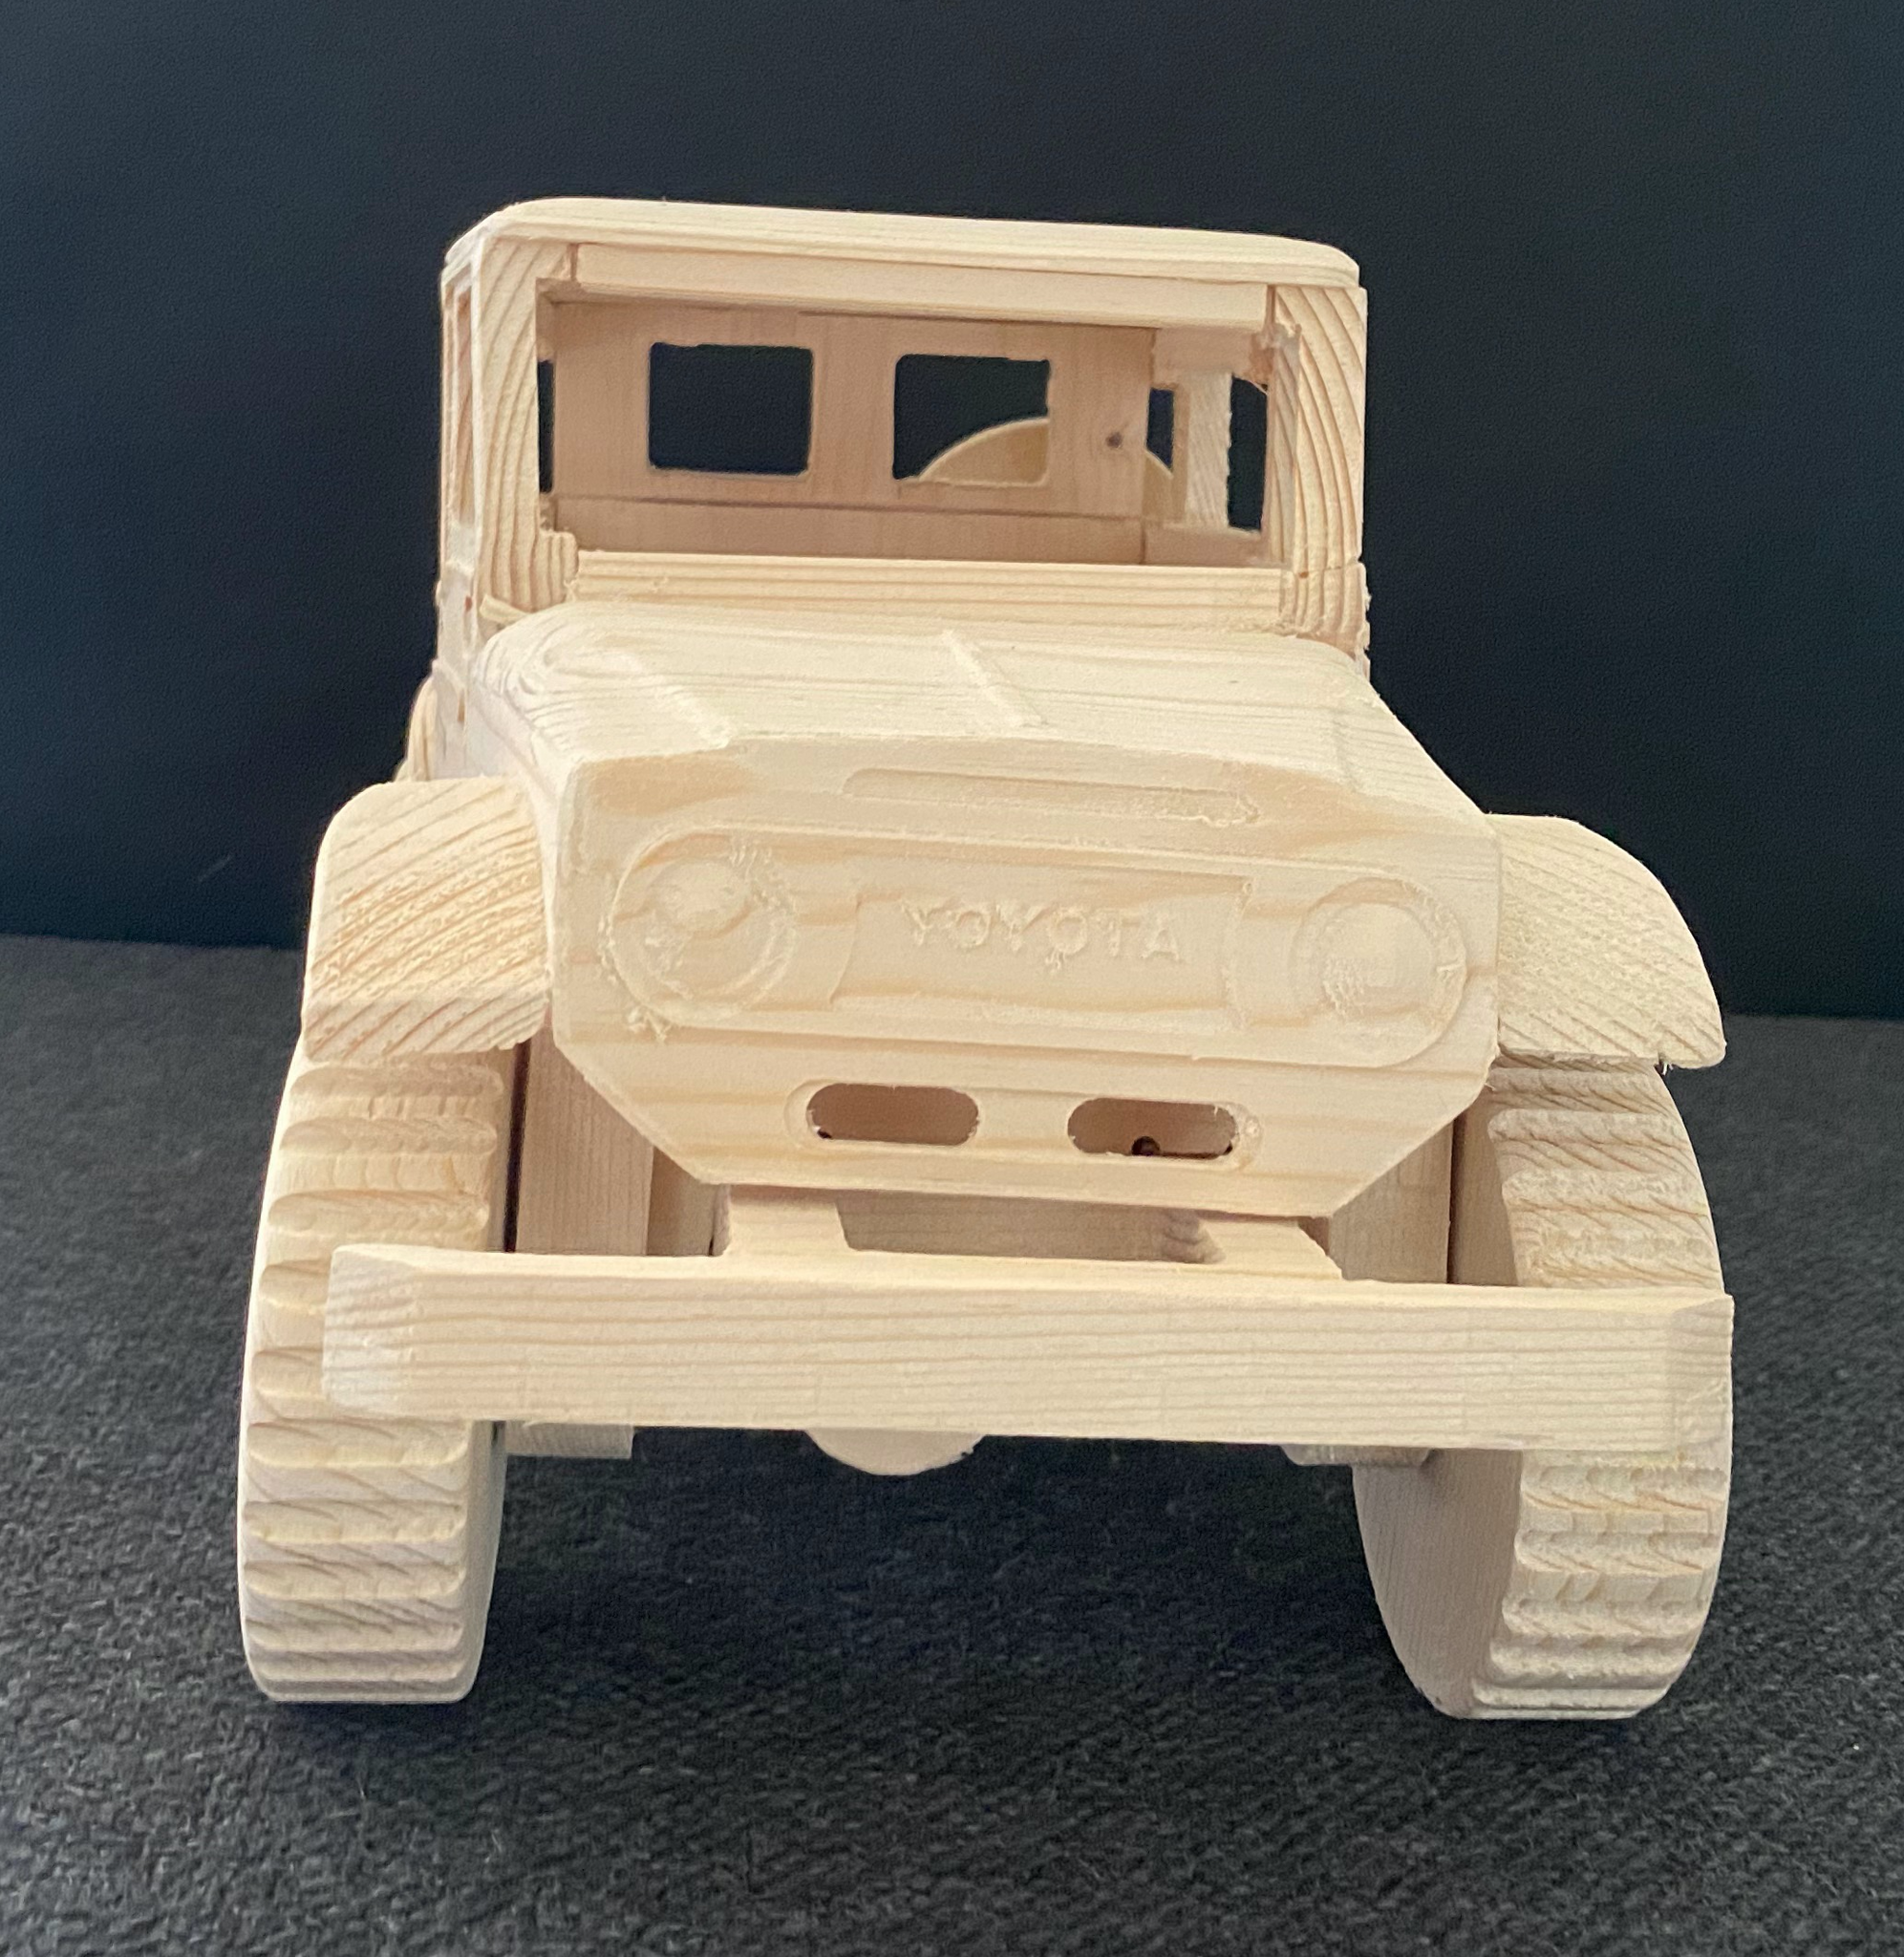 Holz 4x4 - Land Cruiser 40 Serie